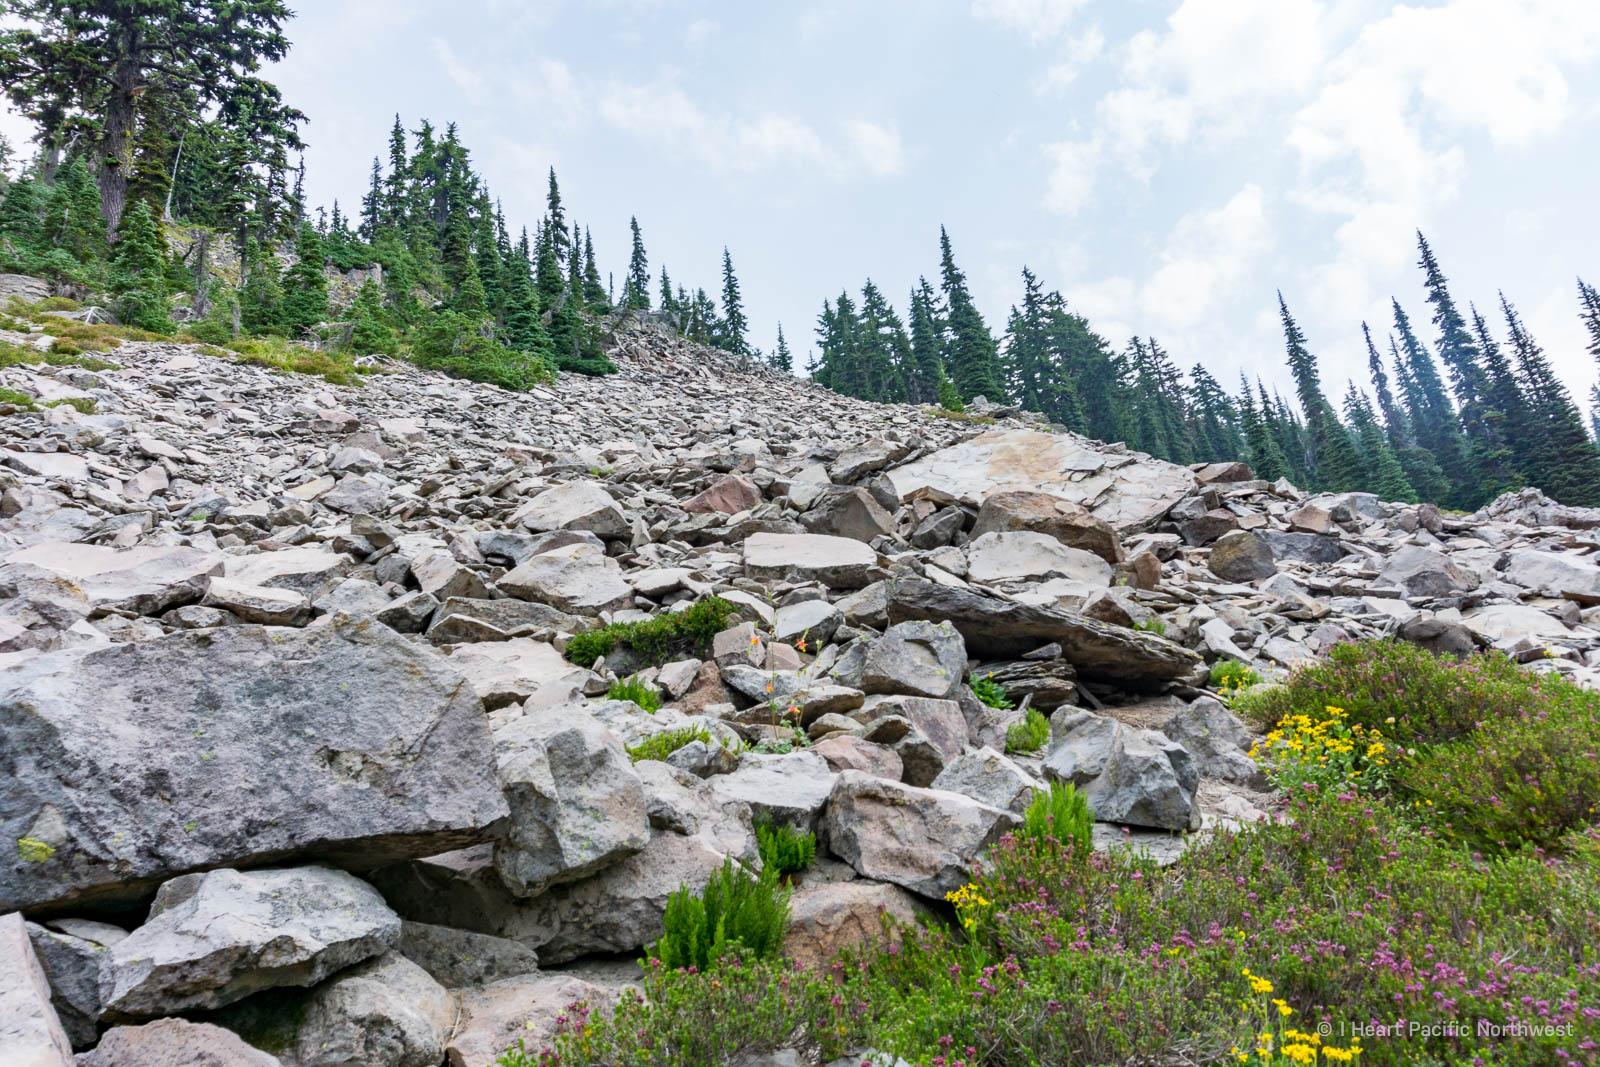 Goat Rocks backpacking trip